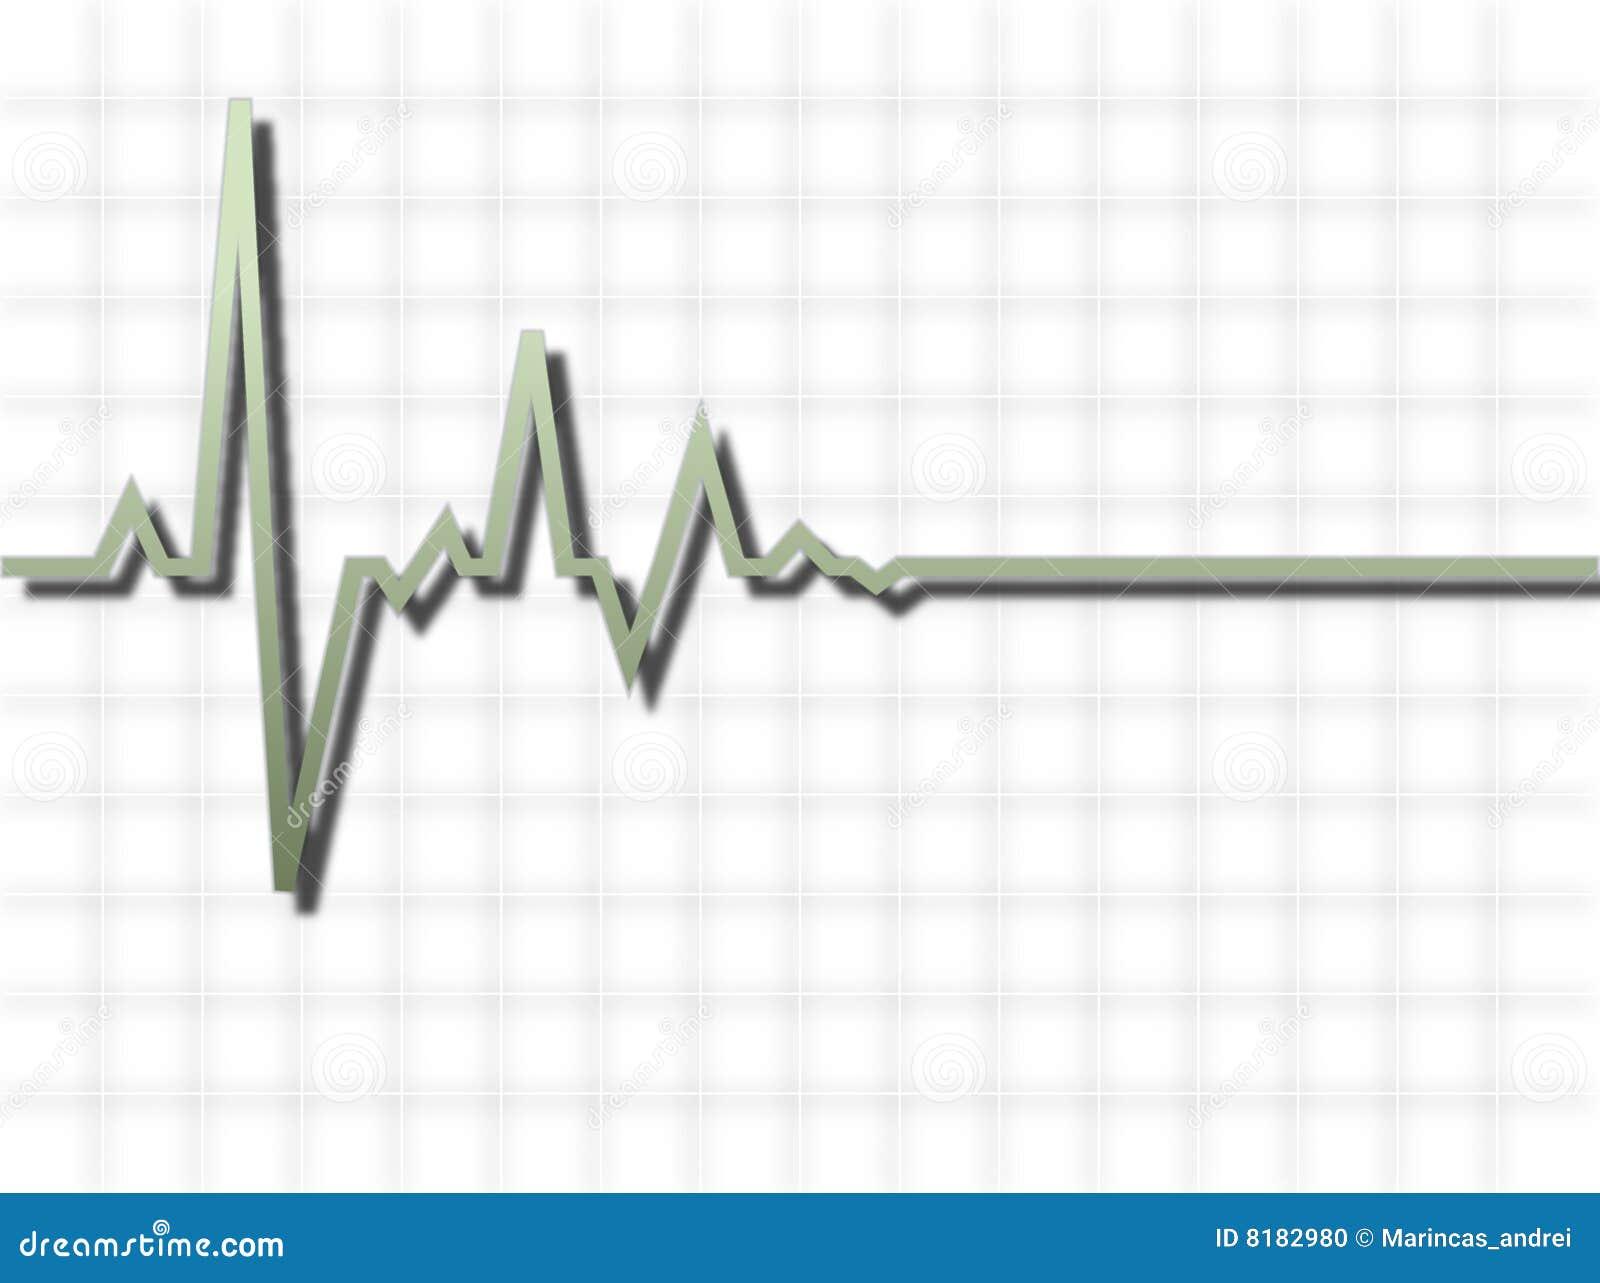 heart pulse illustration stock photo image 8182980. Black Bedroom Furniture Sets. Home Design Ideas